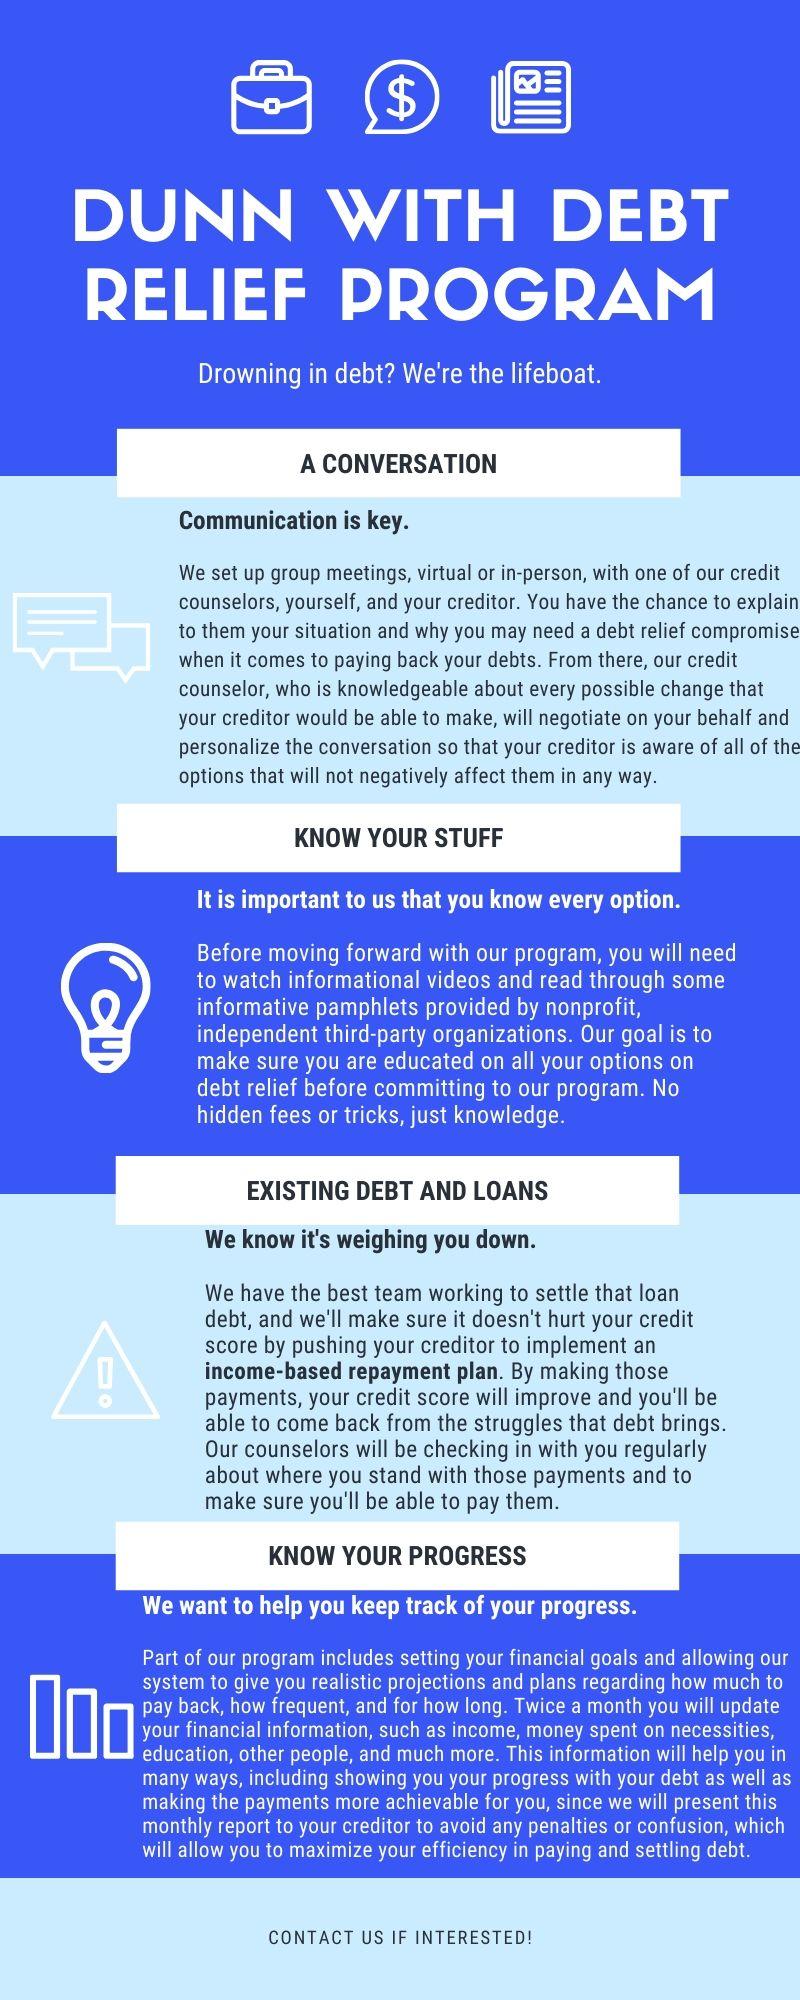 a new debt relief program